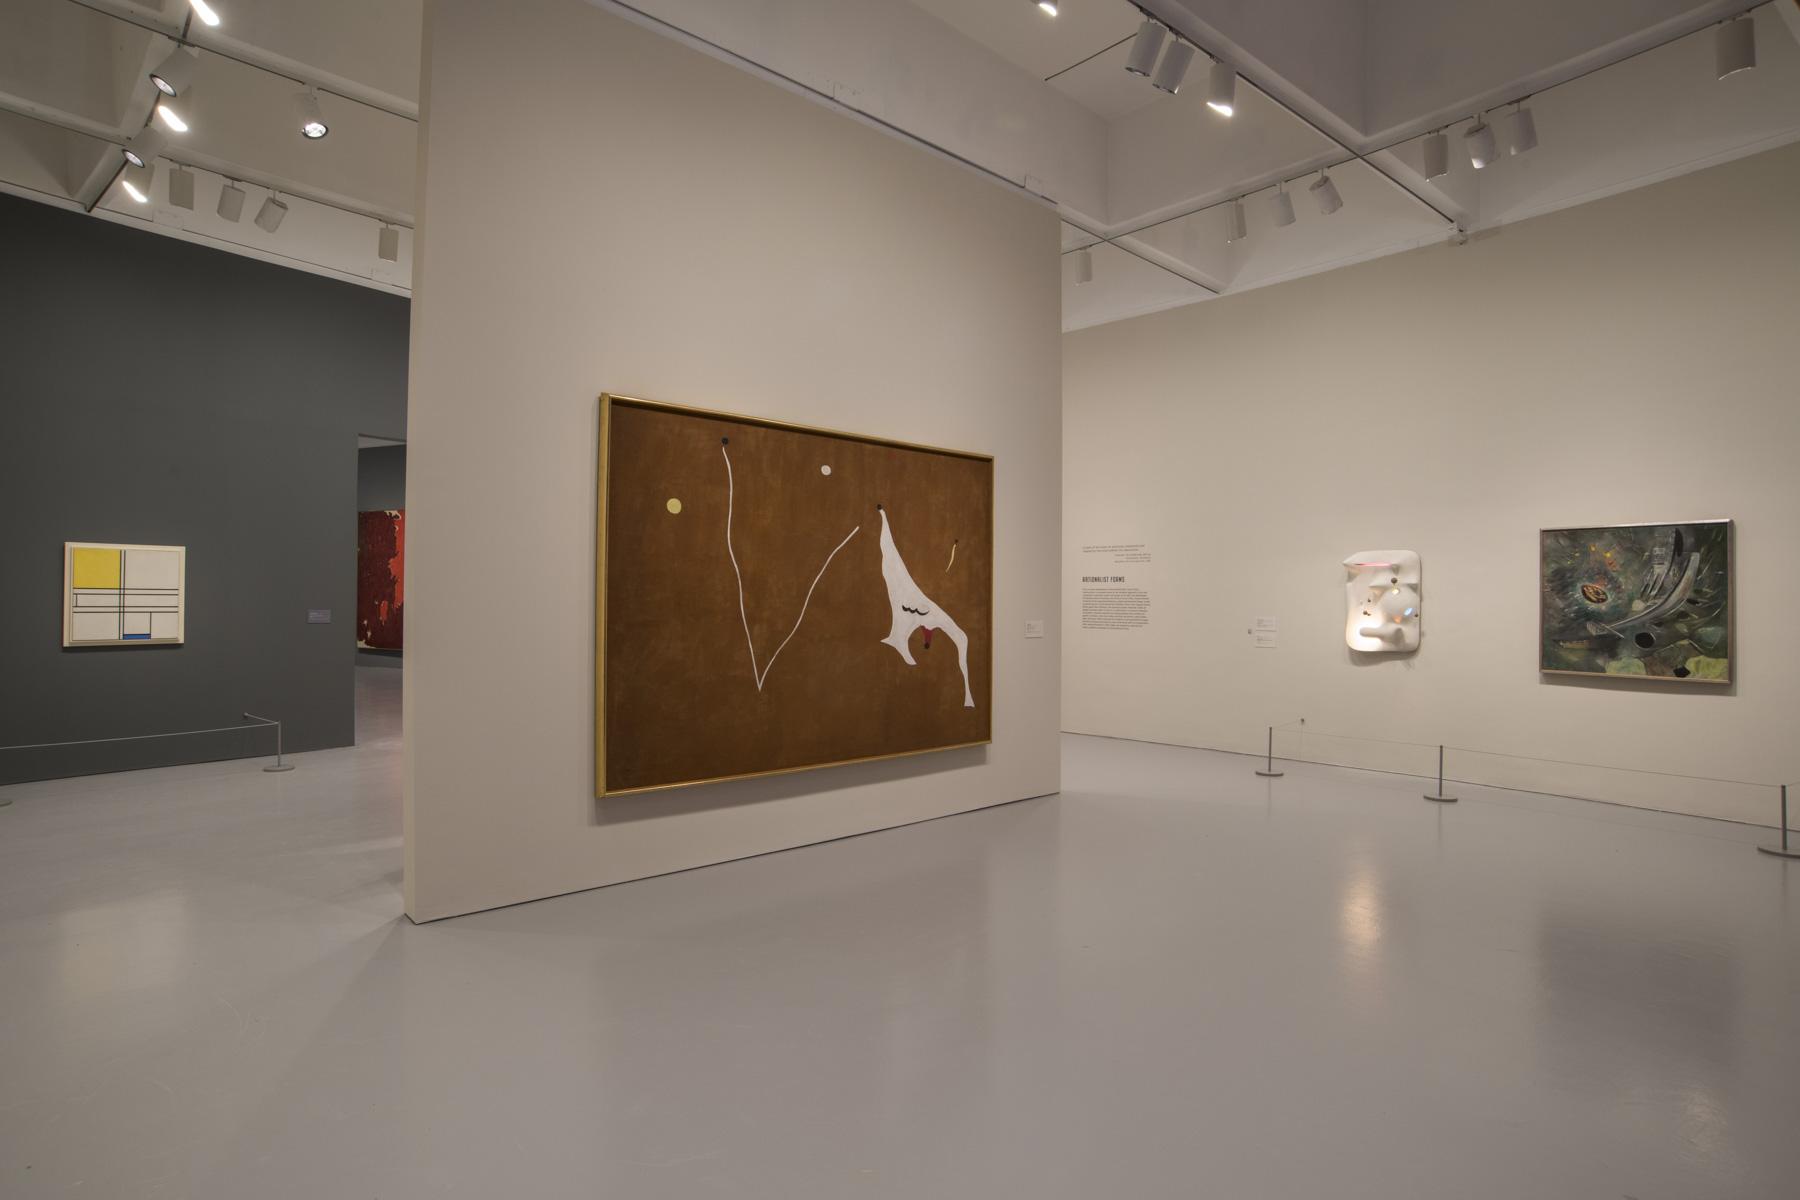 Manifesto: Art x Agency - Hirshhorn Museum and Sculpture